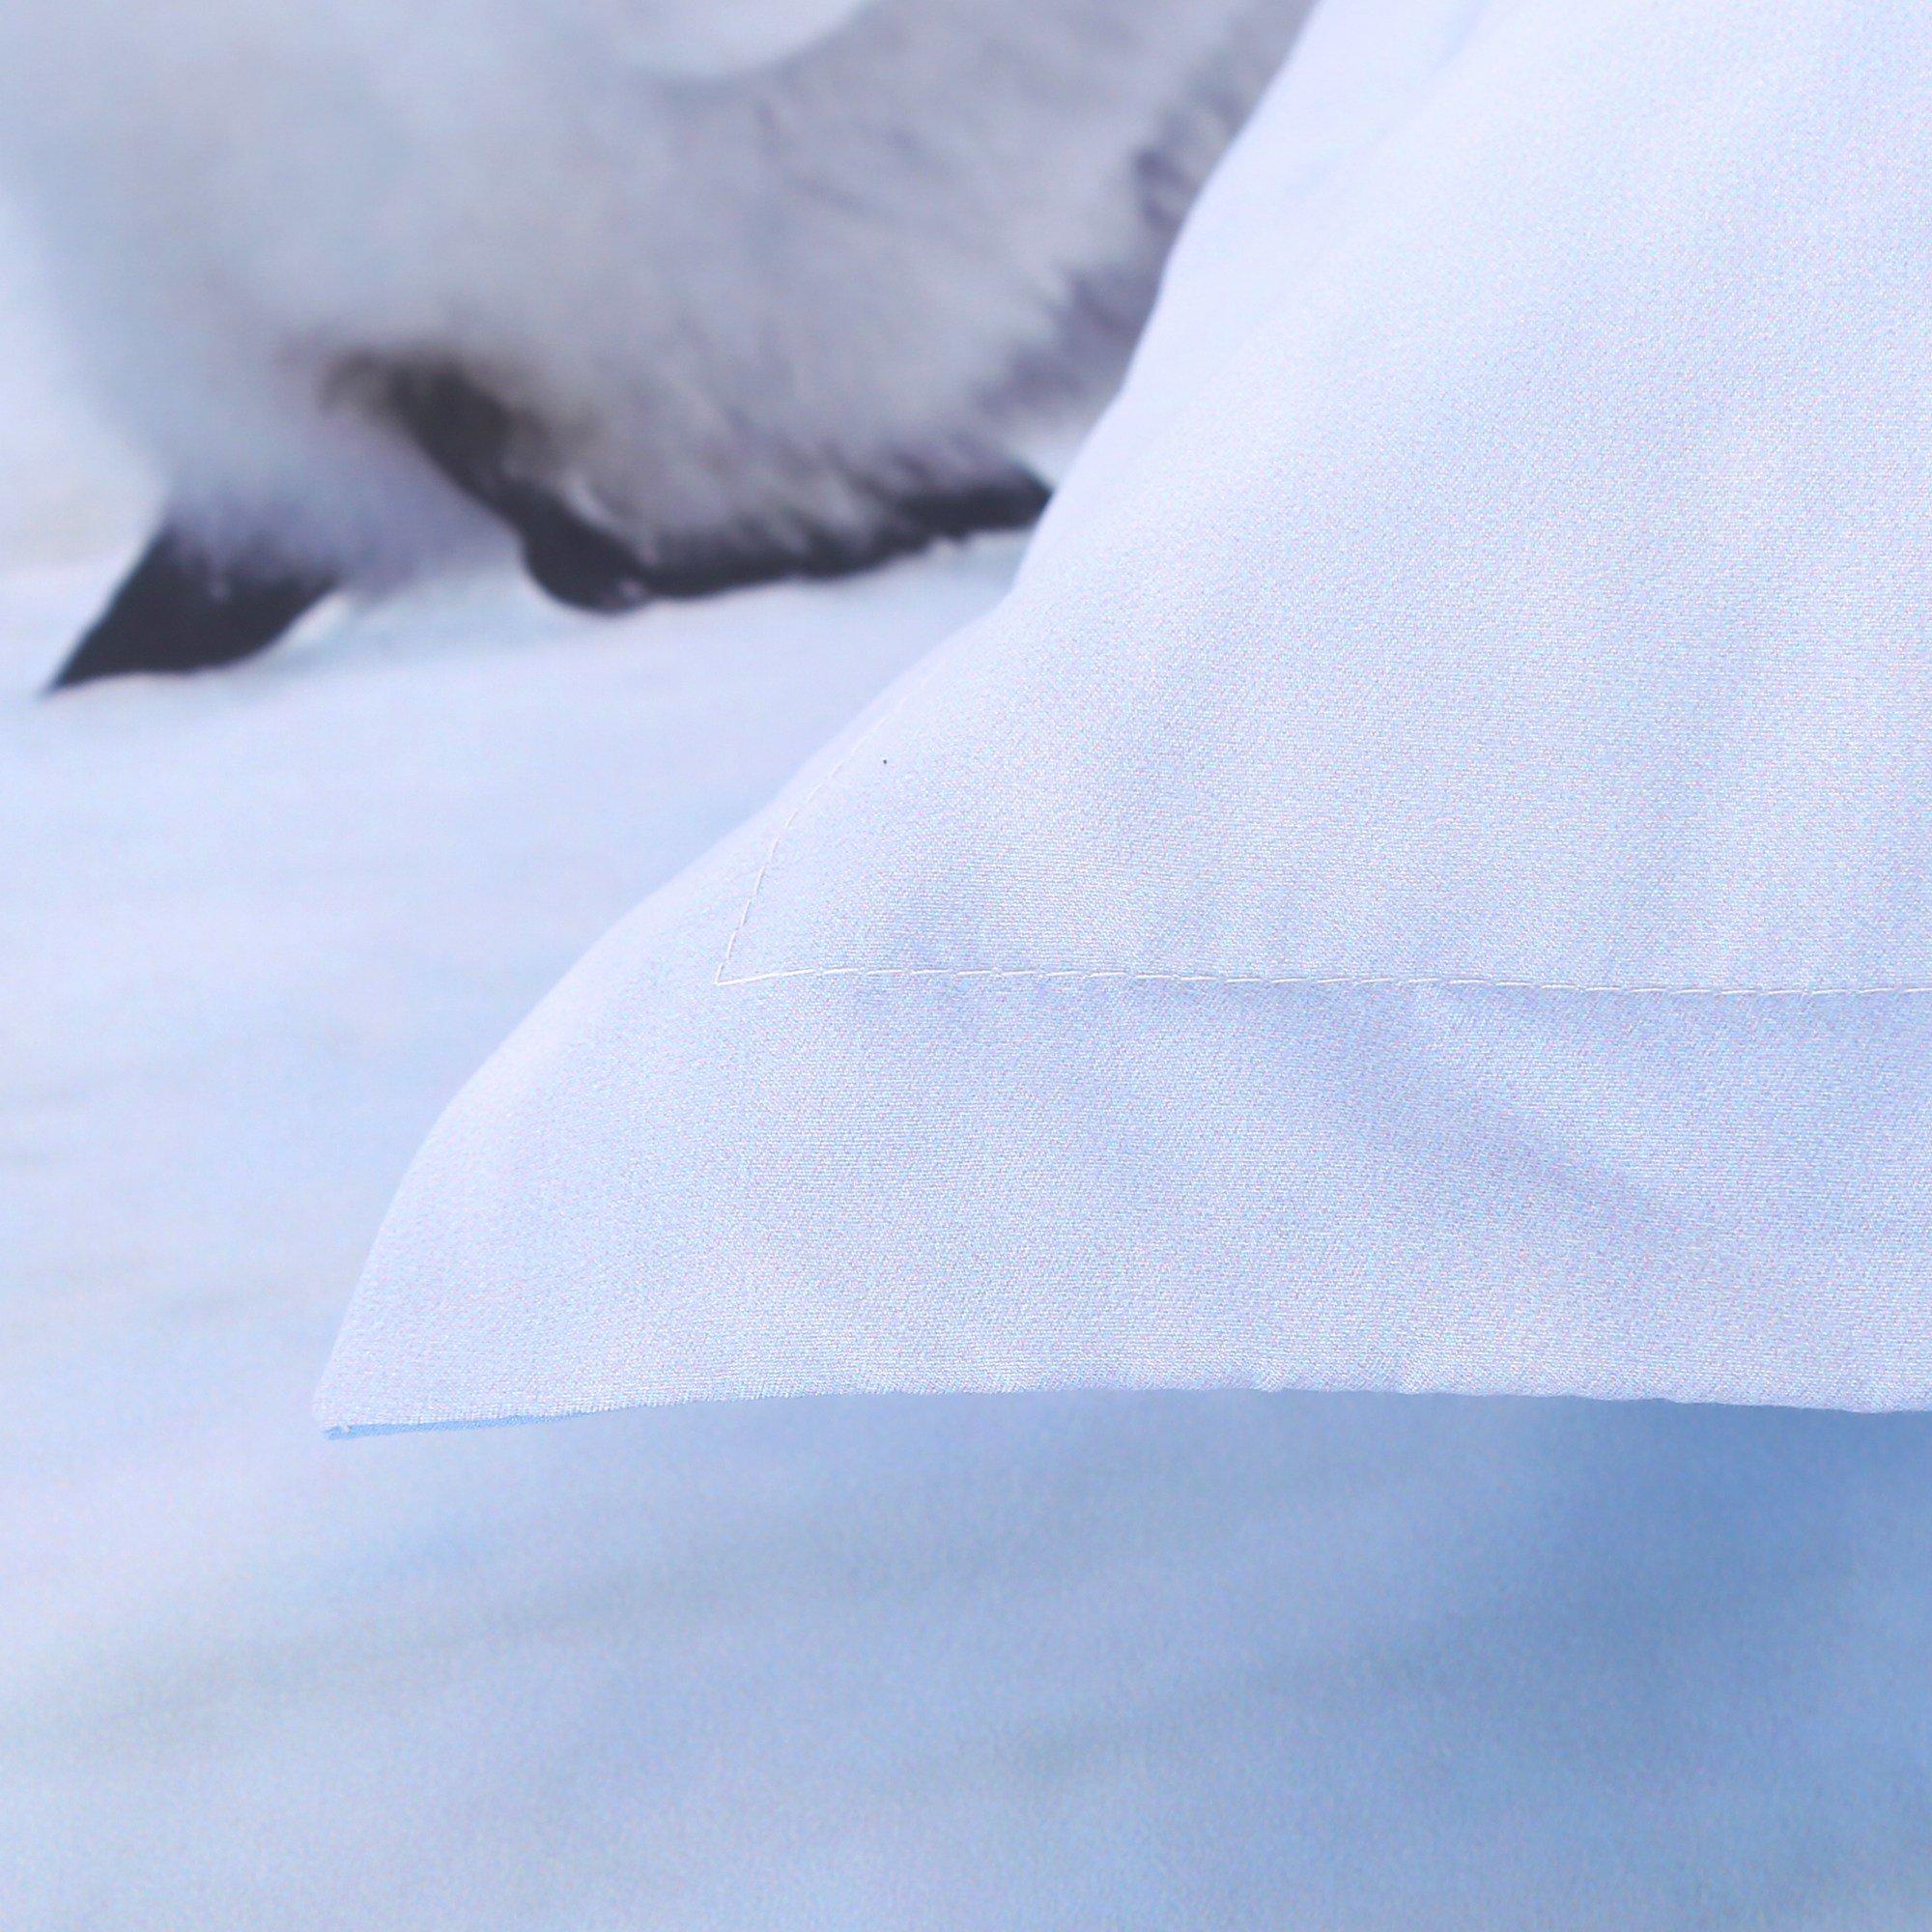 A Group of Cute Penguins Print Light Blue 5-Piece Comforter Sets